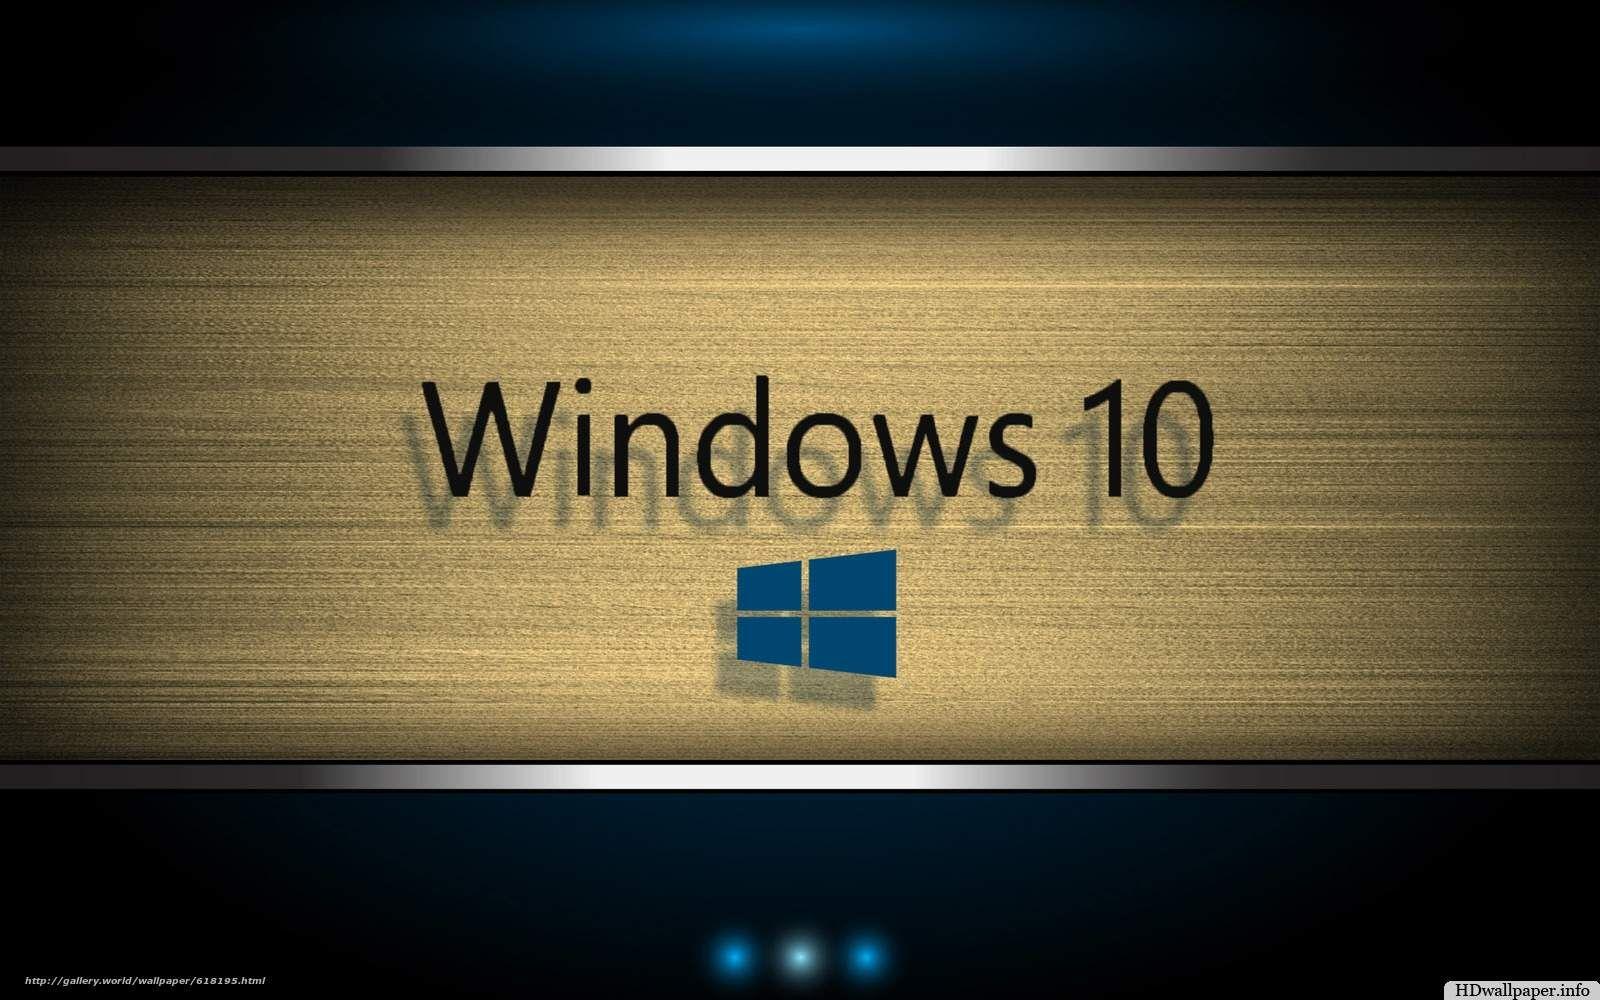 Baixar Wallpaper Windows 10, Papel De Parede, Papel De